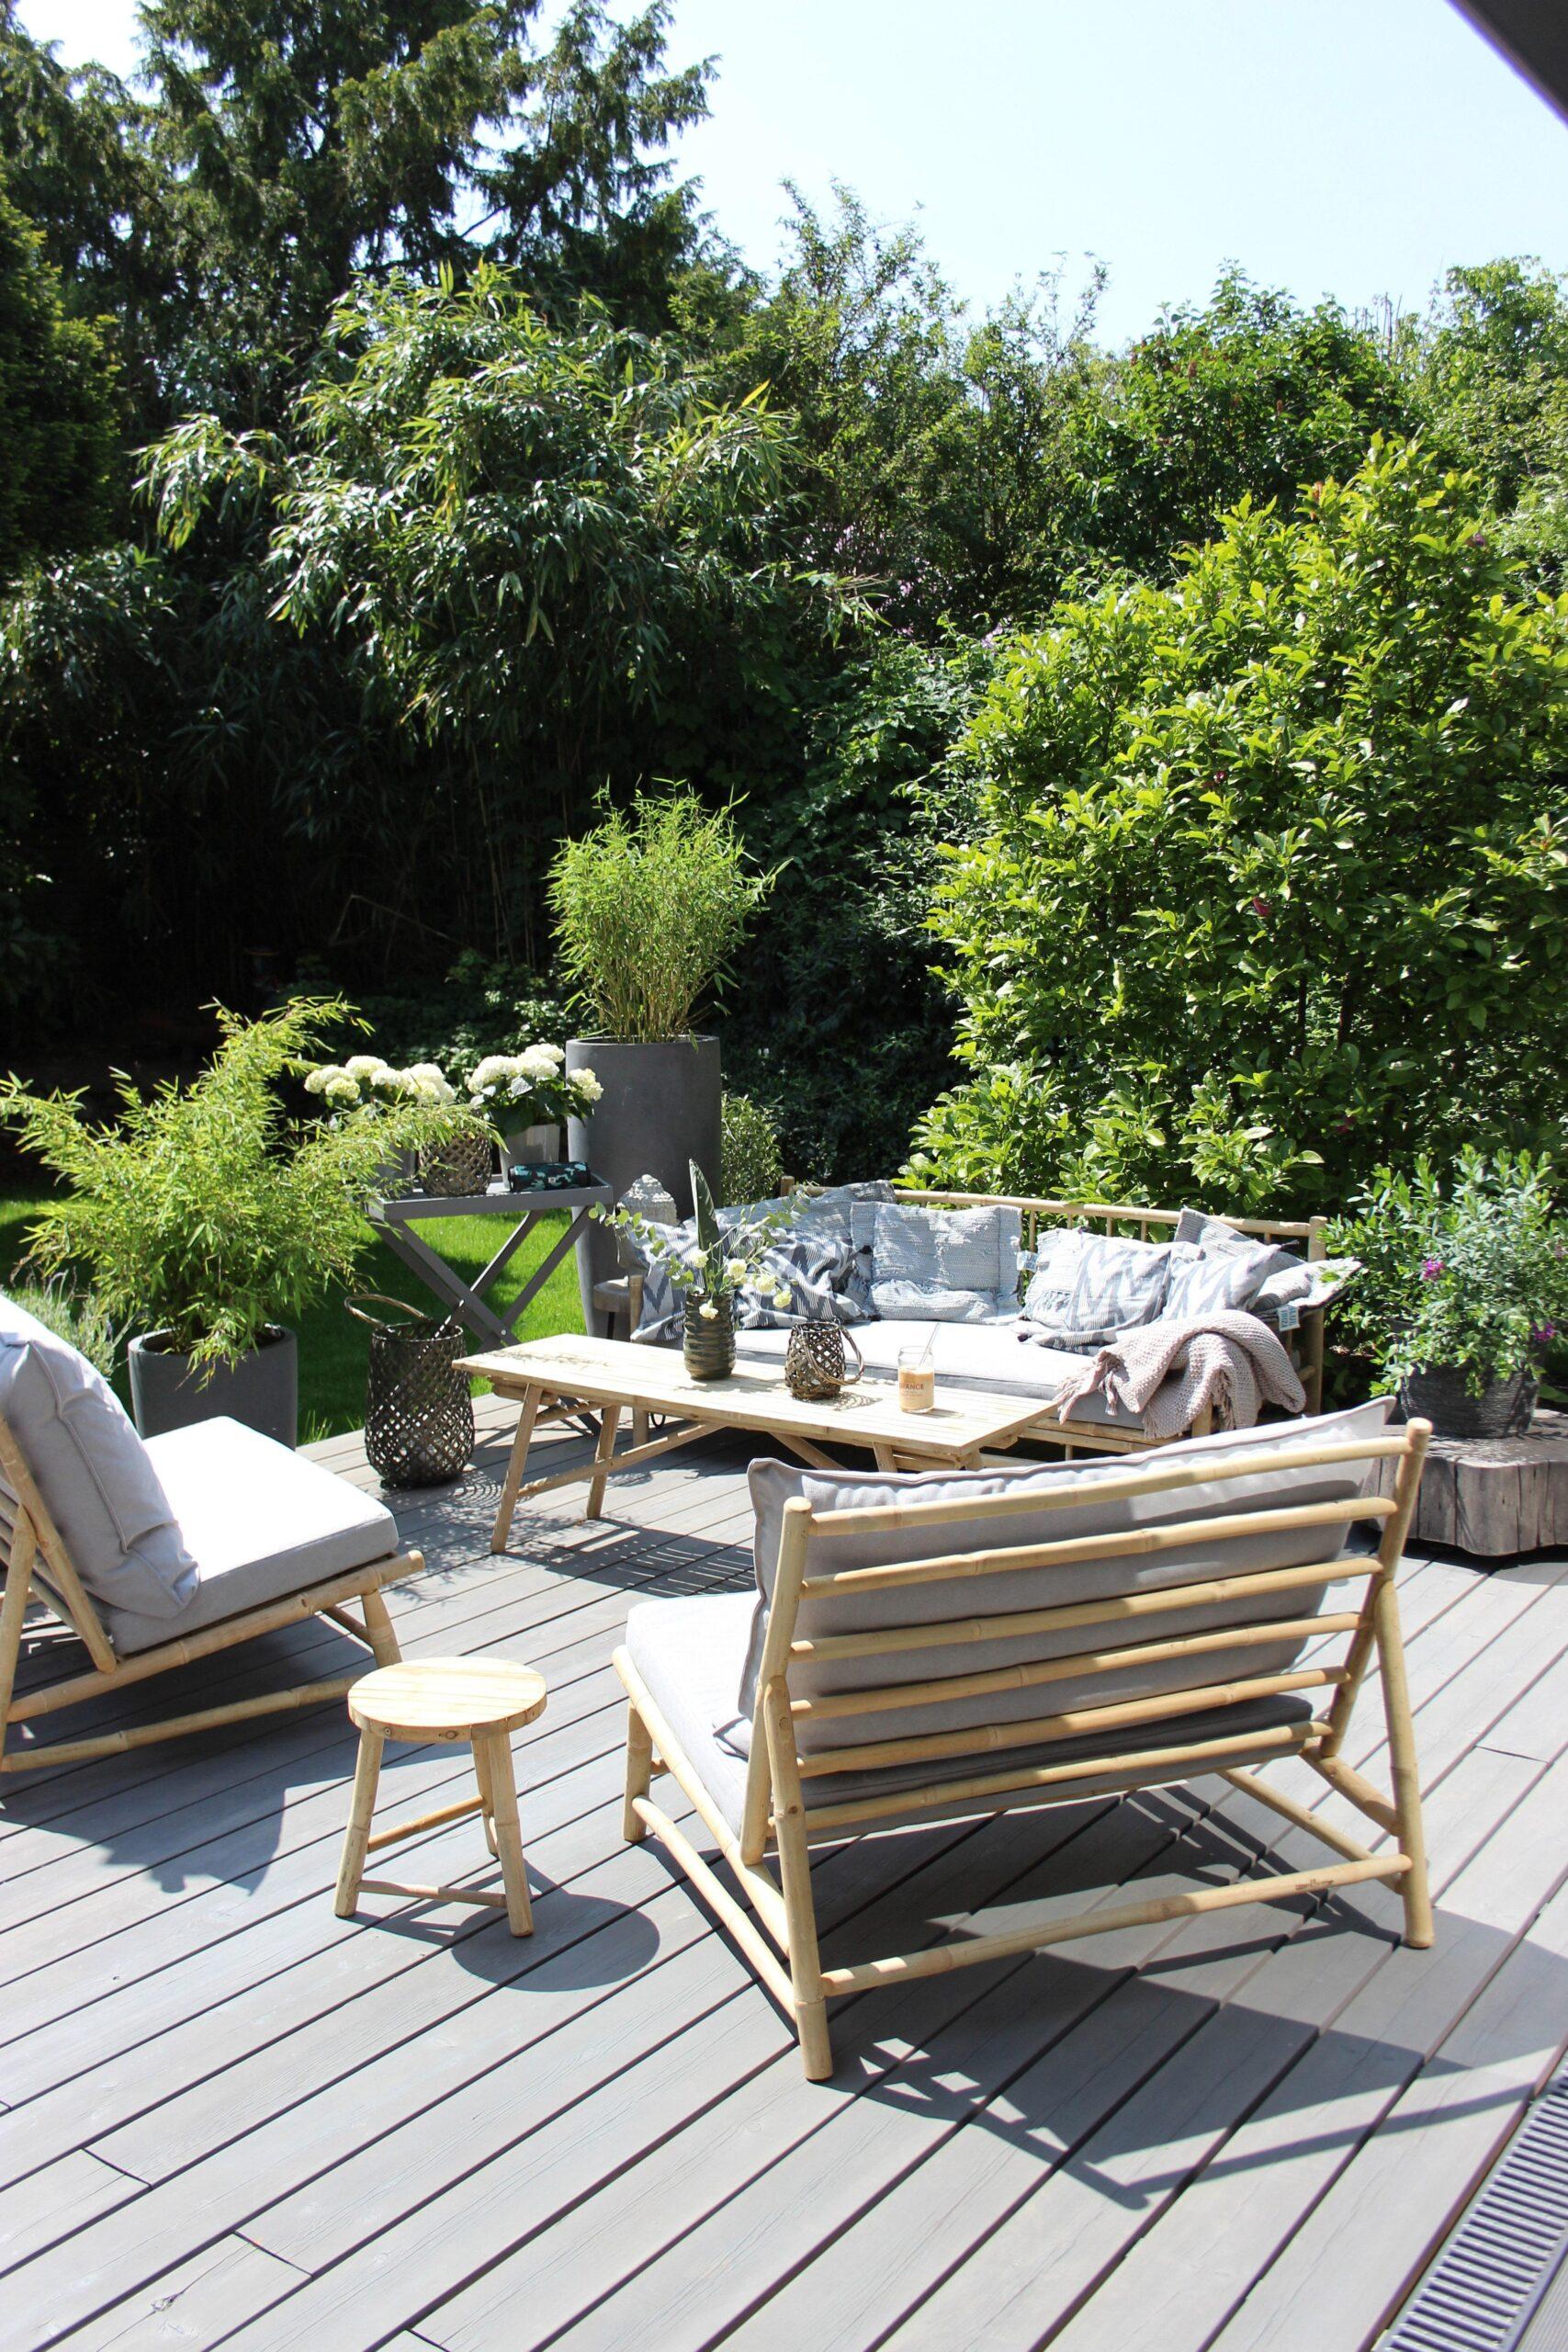 Full Size of Terrassengestaltung Ideen Fr Deinen Outdoor Bereich Garten Paravent Bauhaus Fenster Wohnzimmer Paravent Balkon Bauhaus